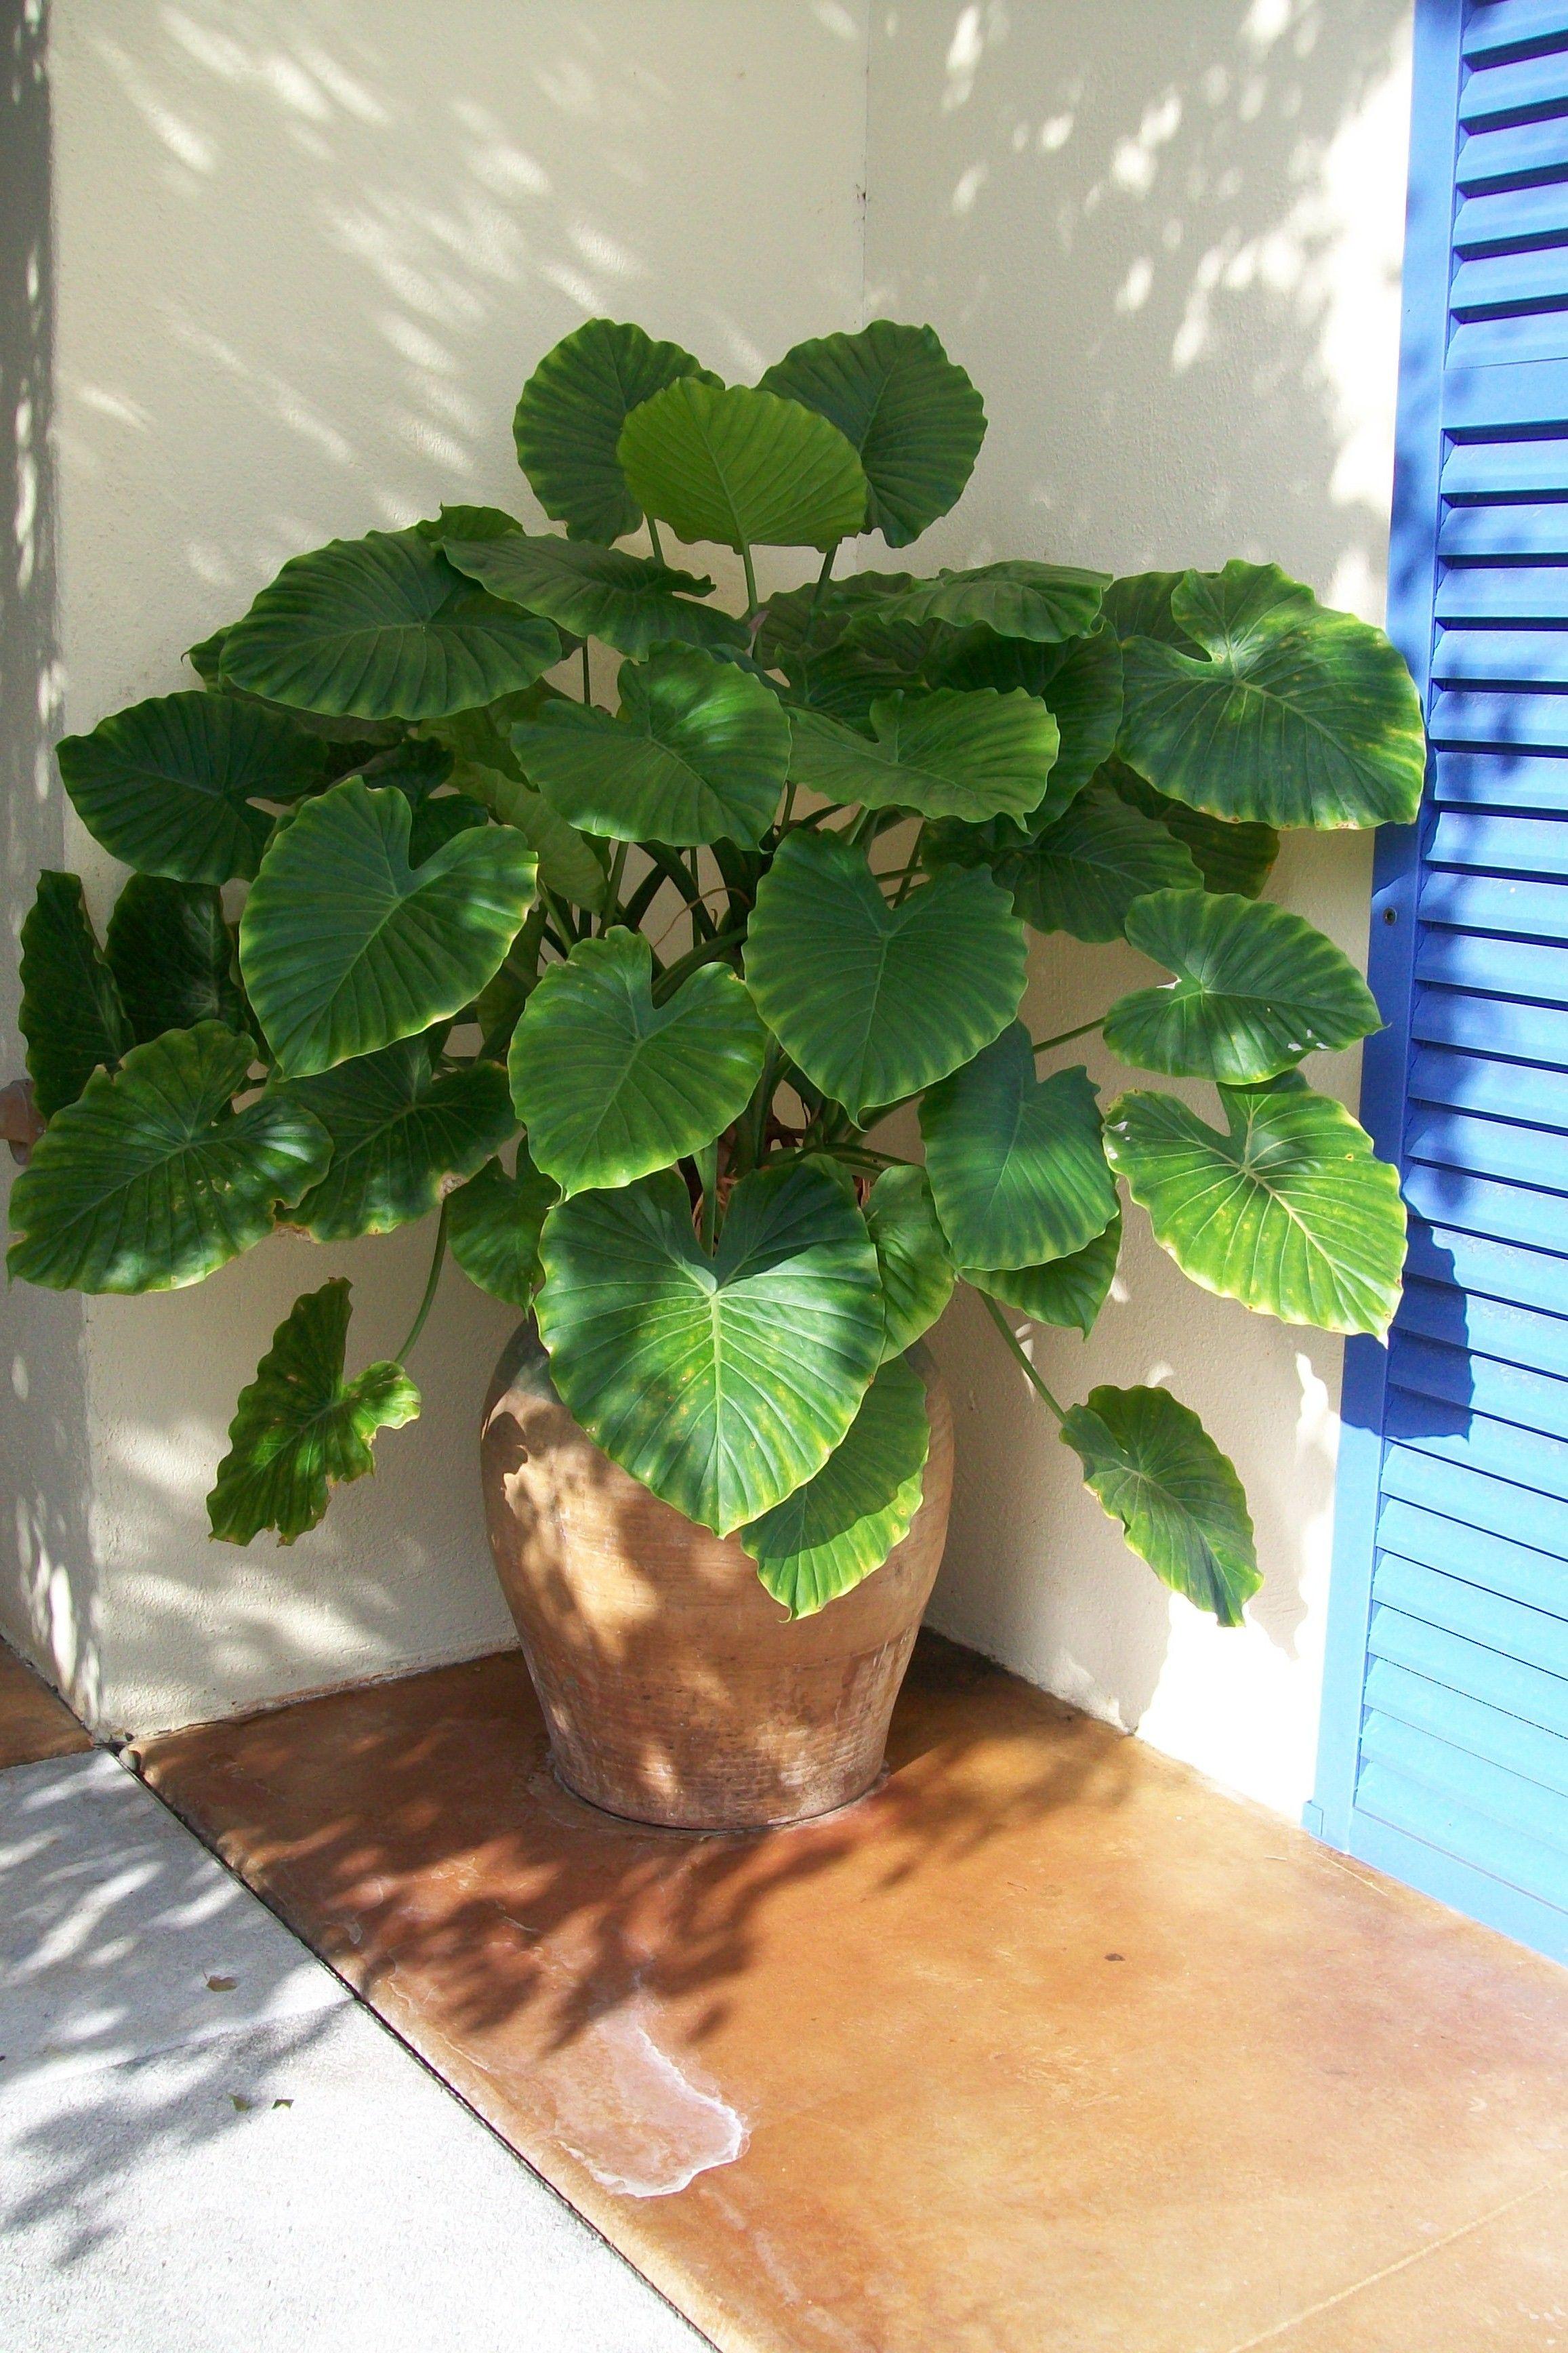 House flowers Alocasia: beautiful, but dangerous